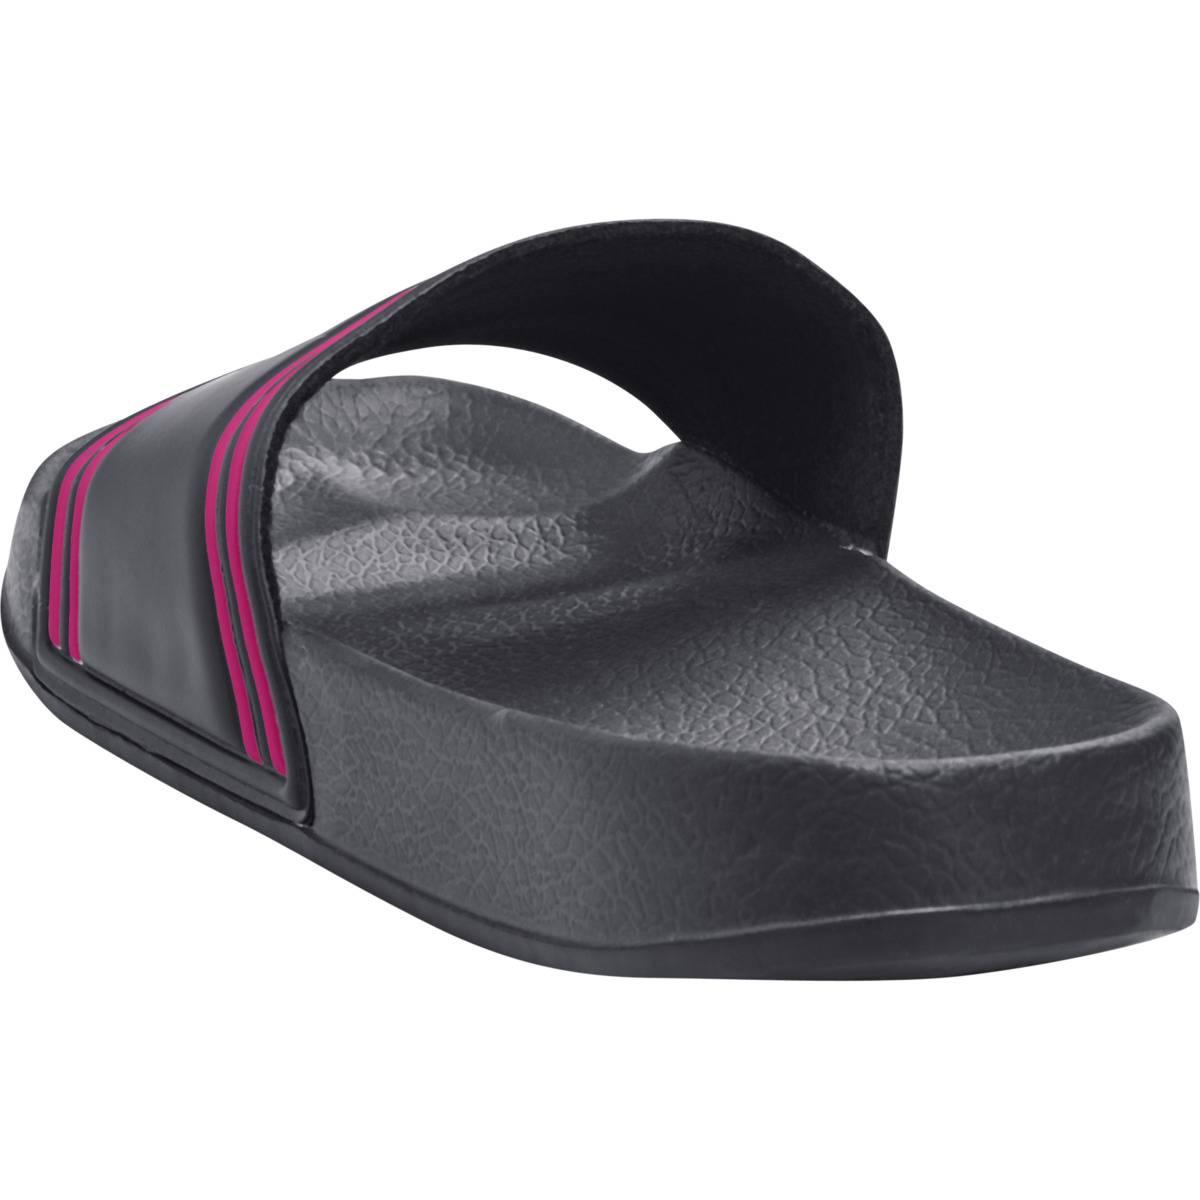 Hummel Pool Slide - Black iris/rosa